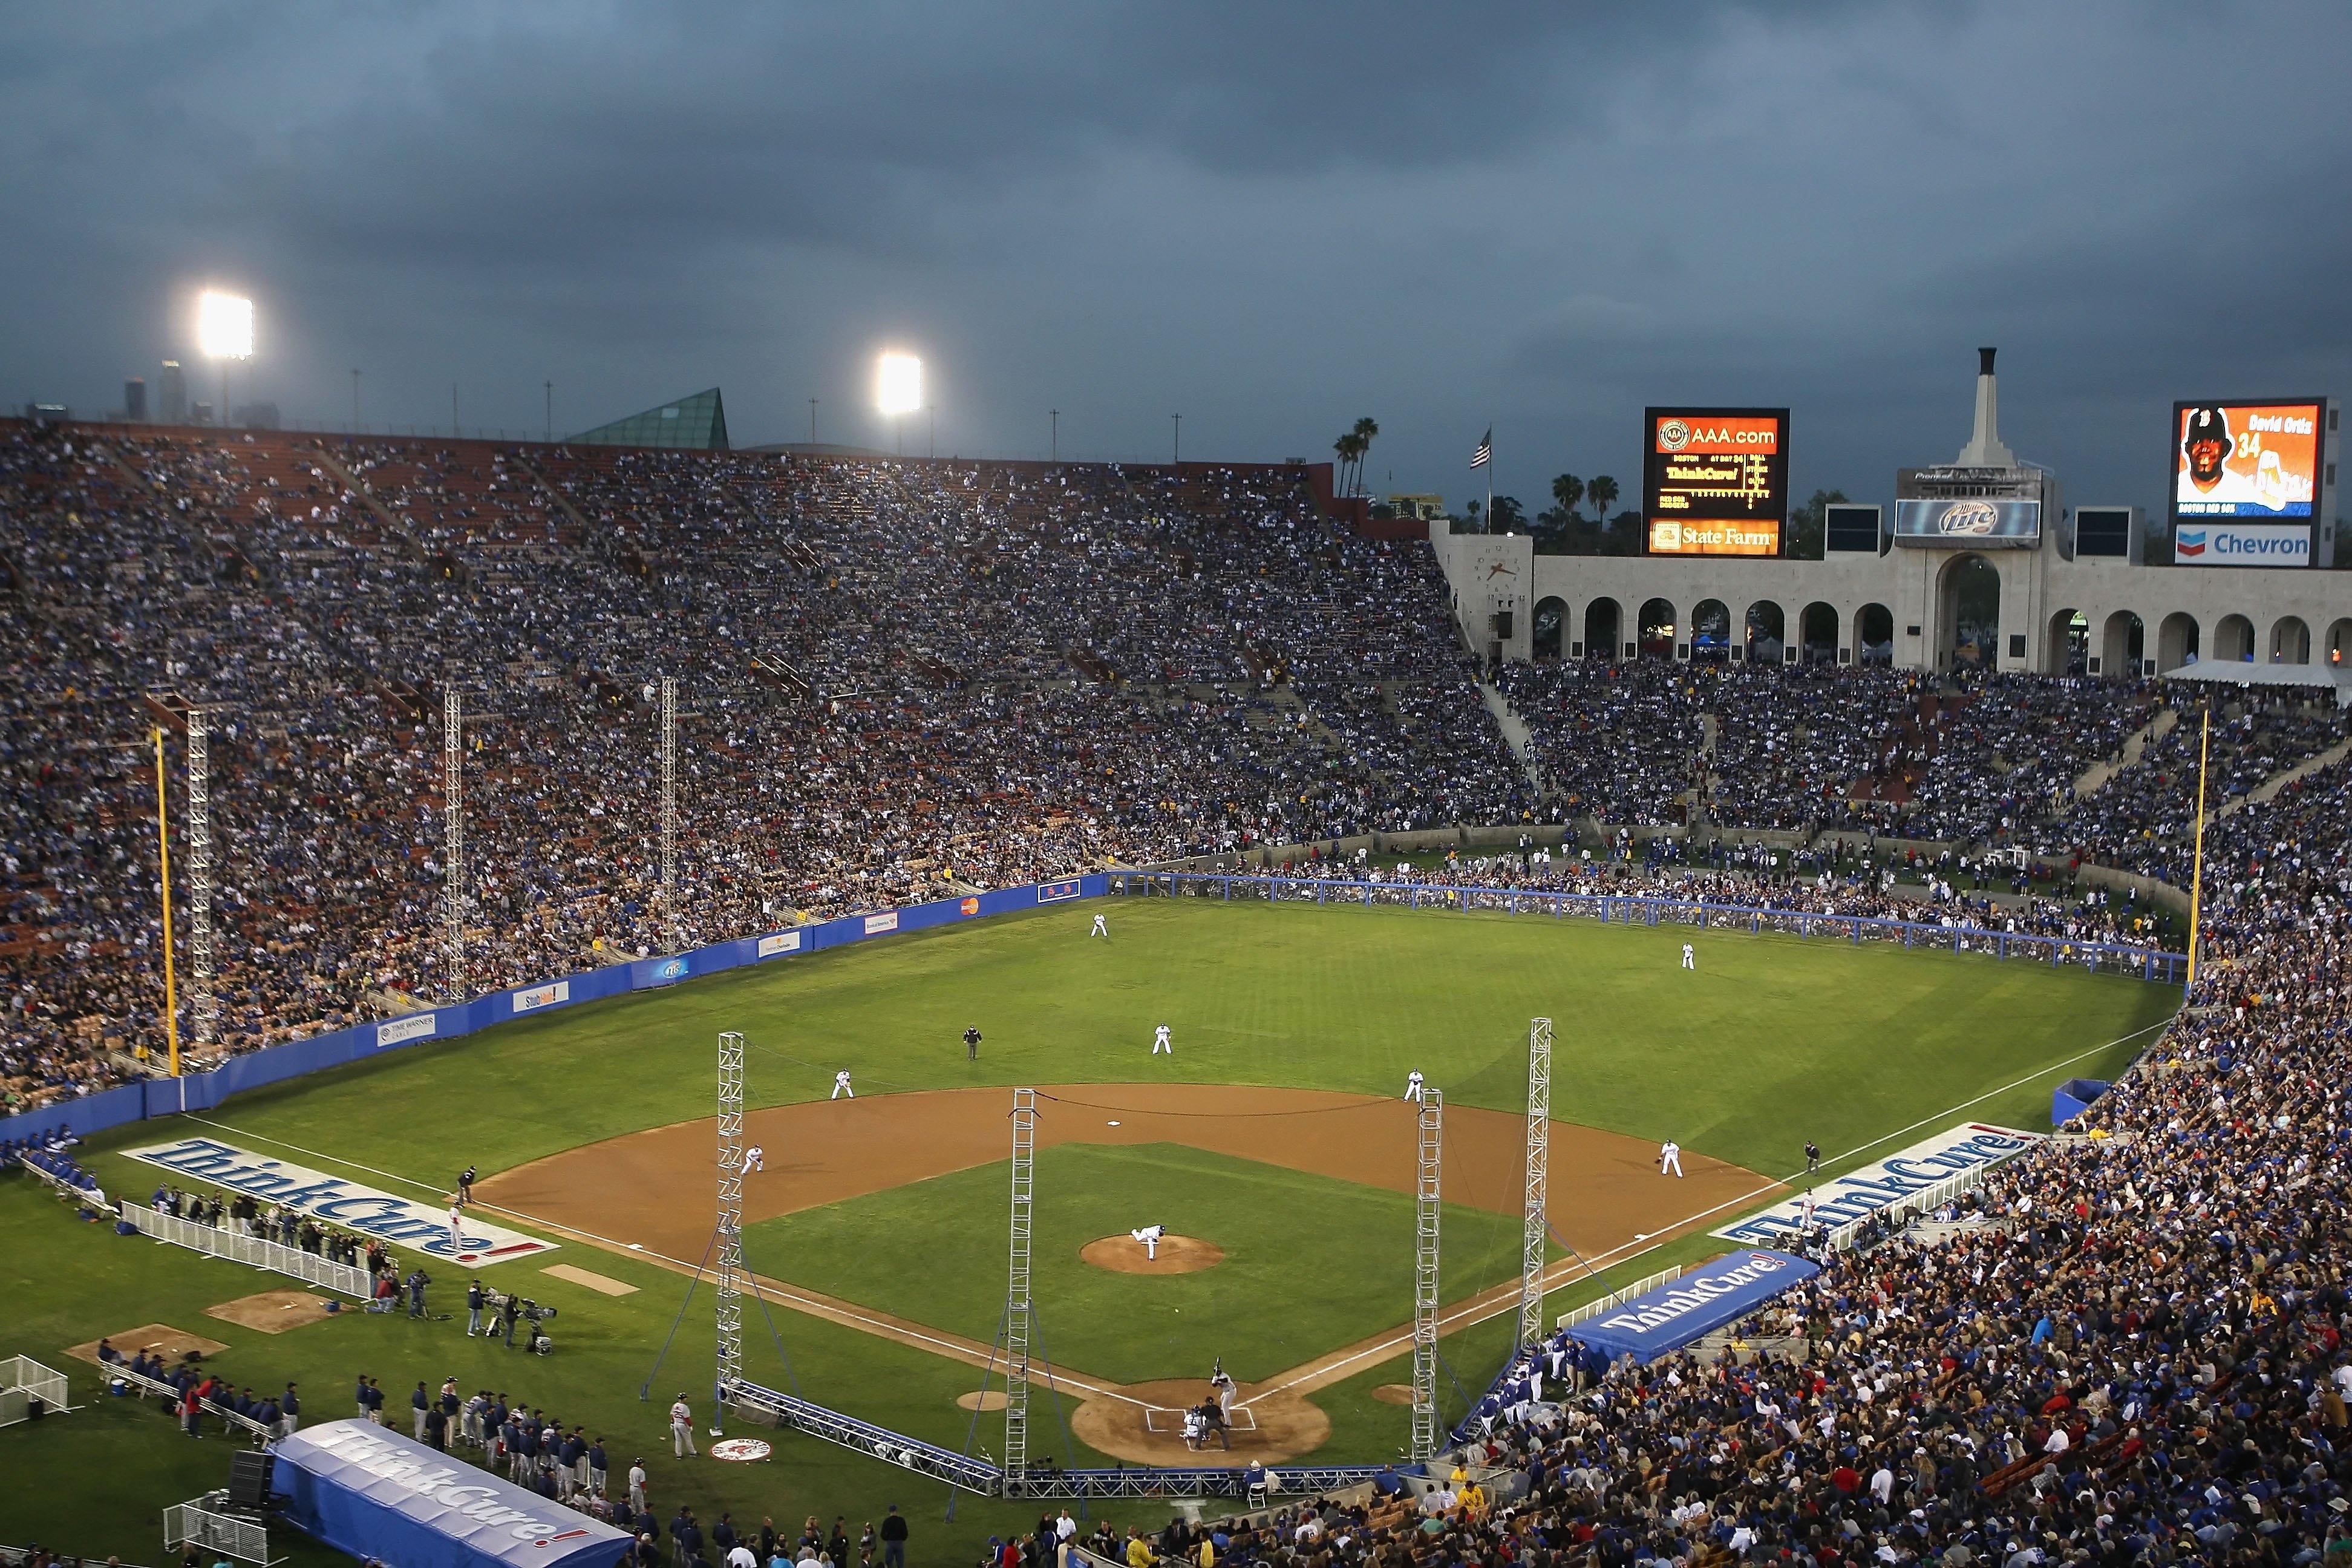 Boston Red Sox v Los Angeles Dodgers